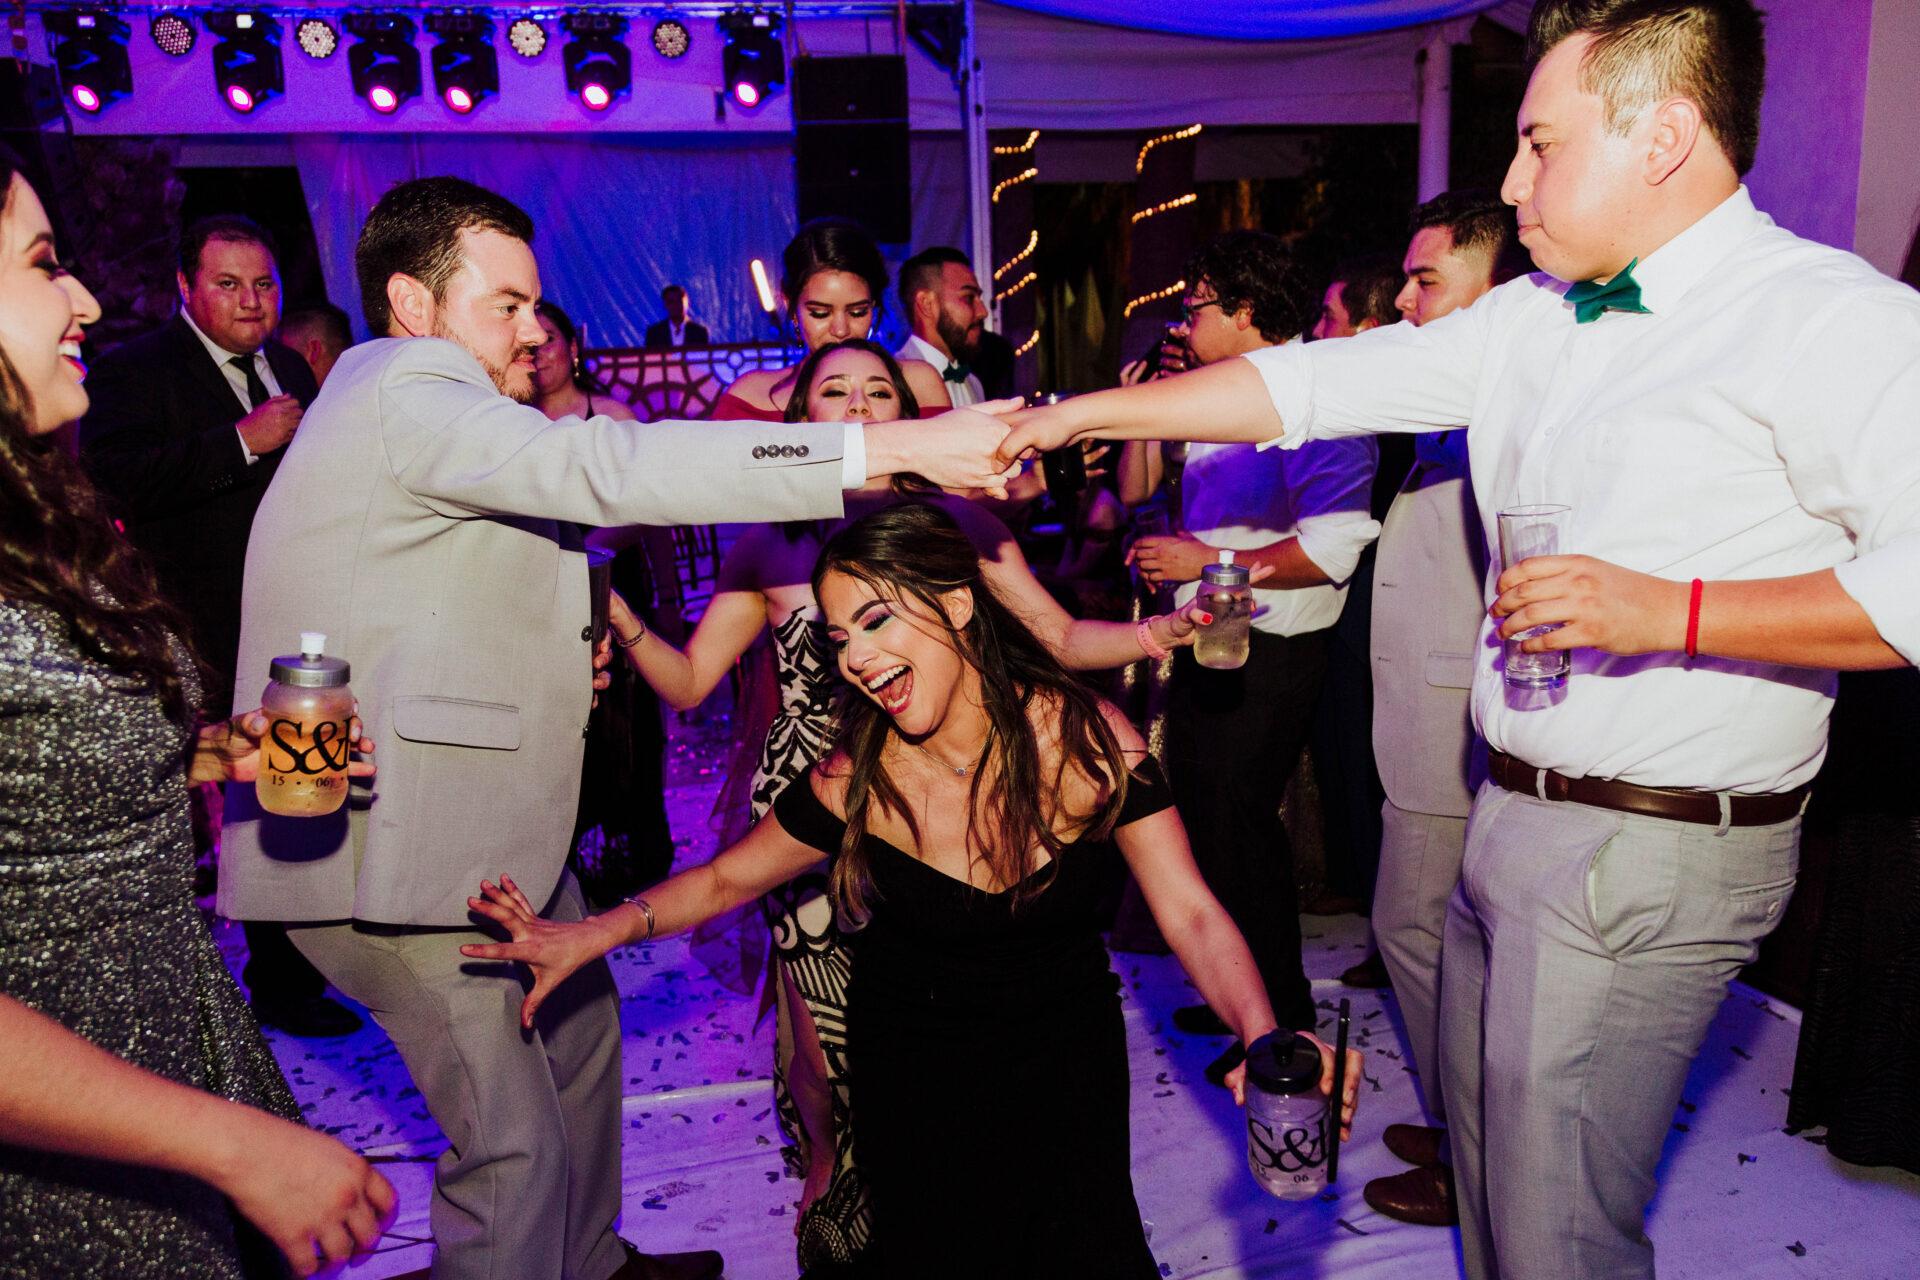 javier_noriega_fotografo_bodas_torreon_coahuila_zacatecas_wedding_photographer64a